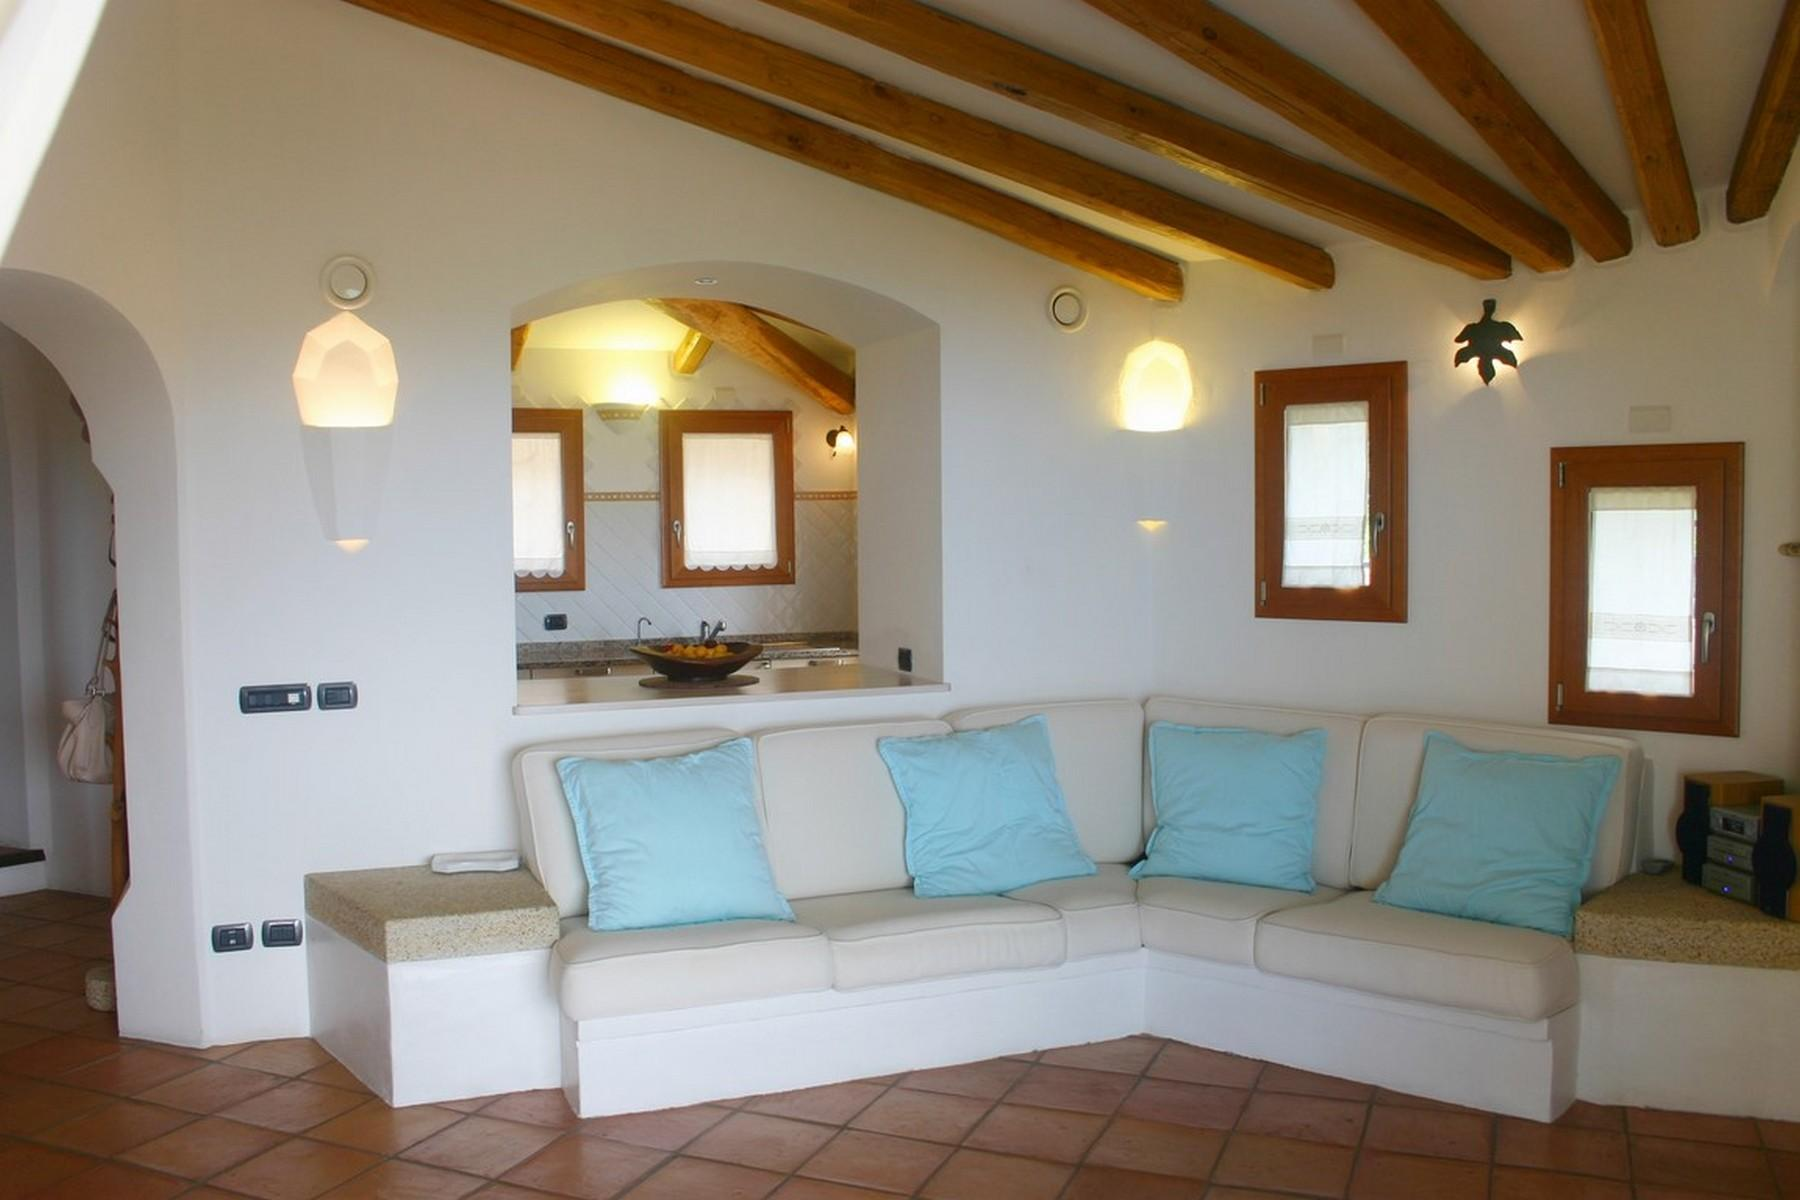 Porto Cervo Abbiadori Splendide villa jumelée avec vue sur le golfe de Pevero - 15